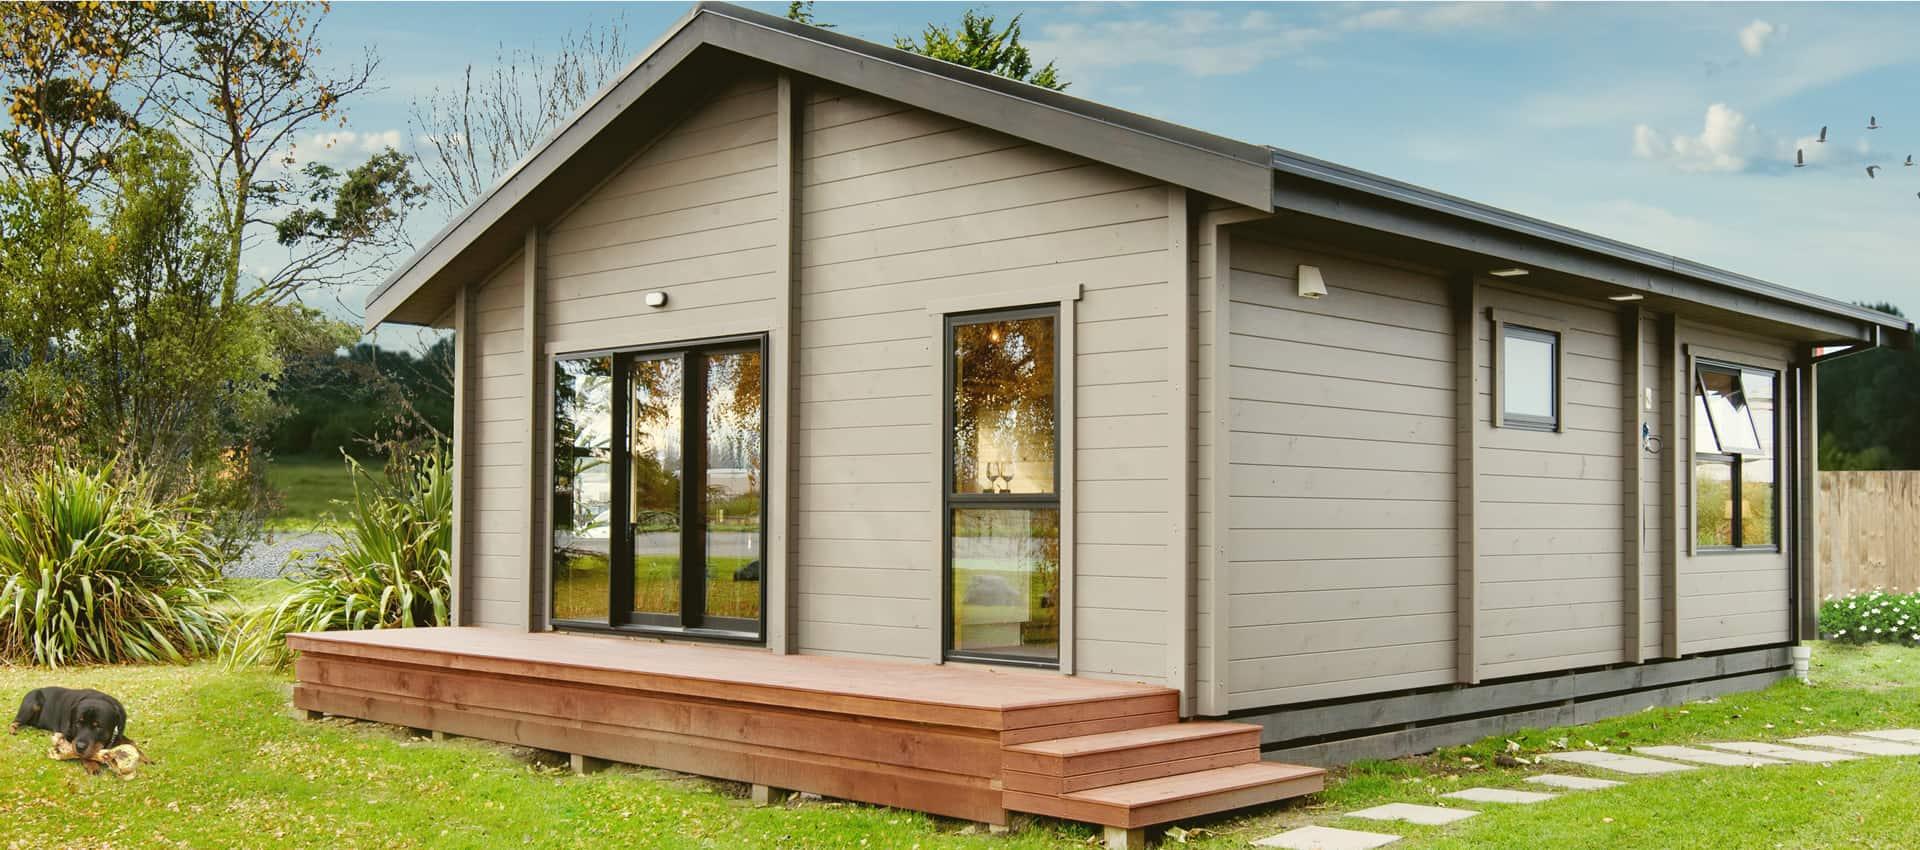 Christchurch Showhomes Granny Flat Tiny Home At Kainga